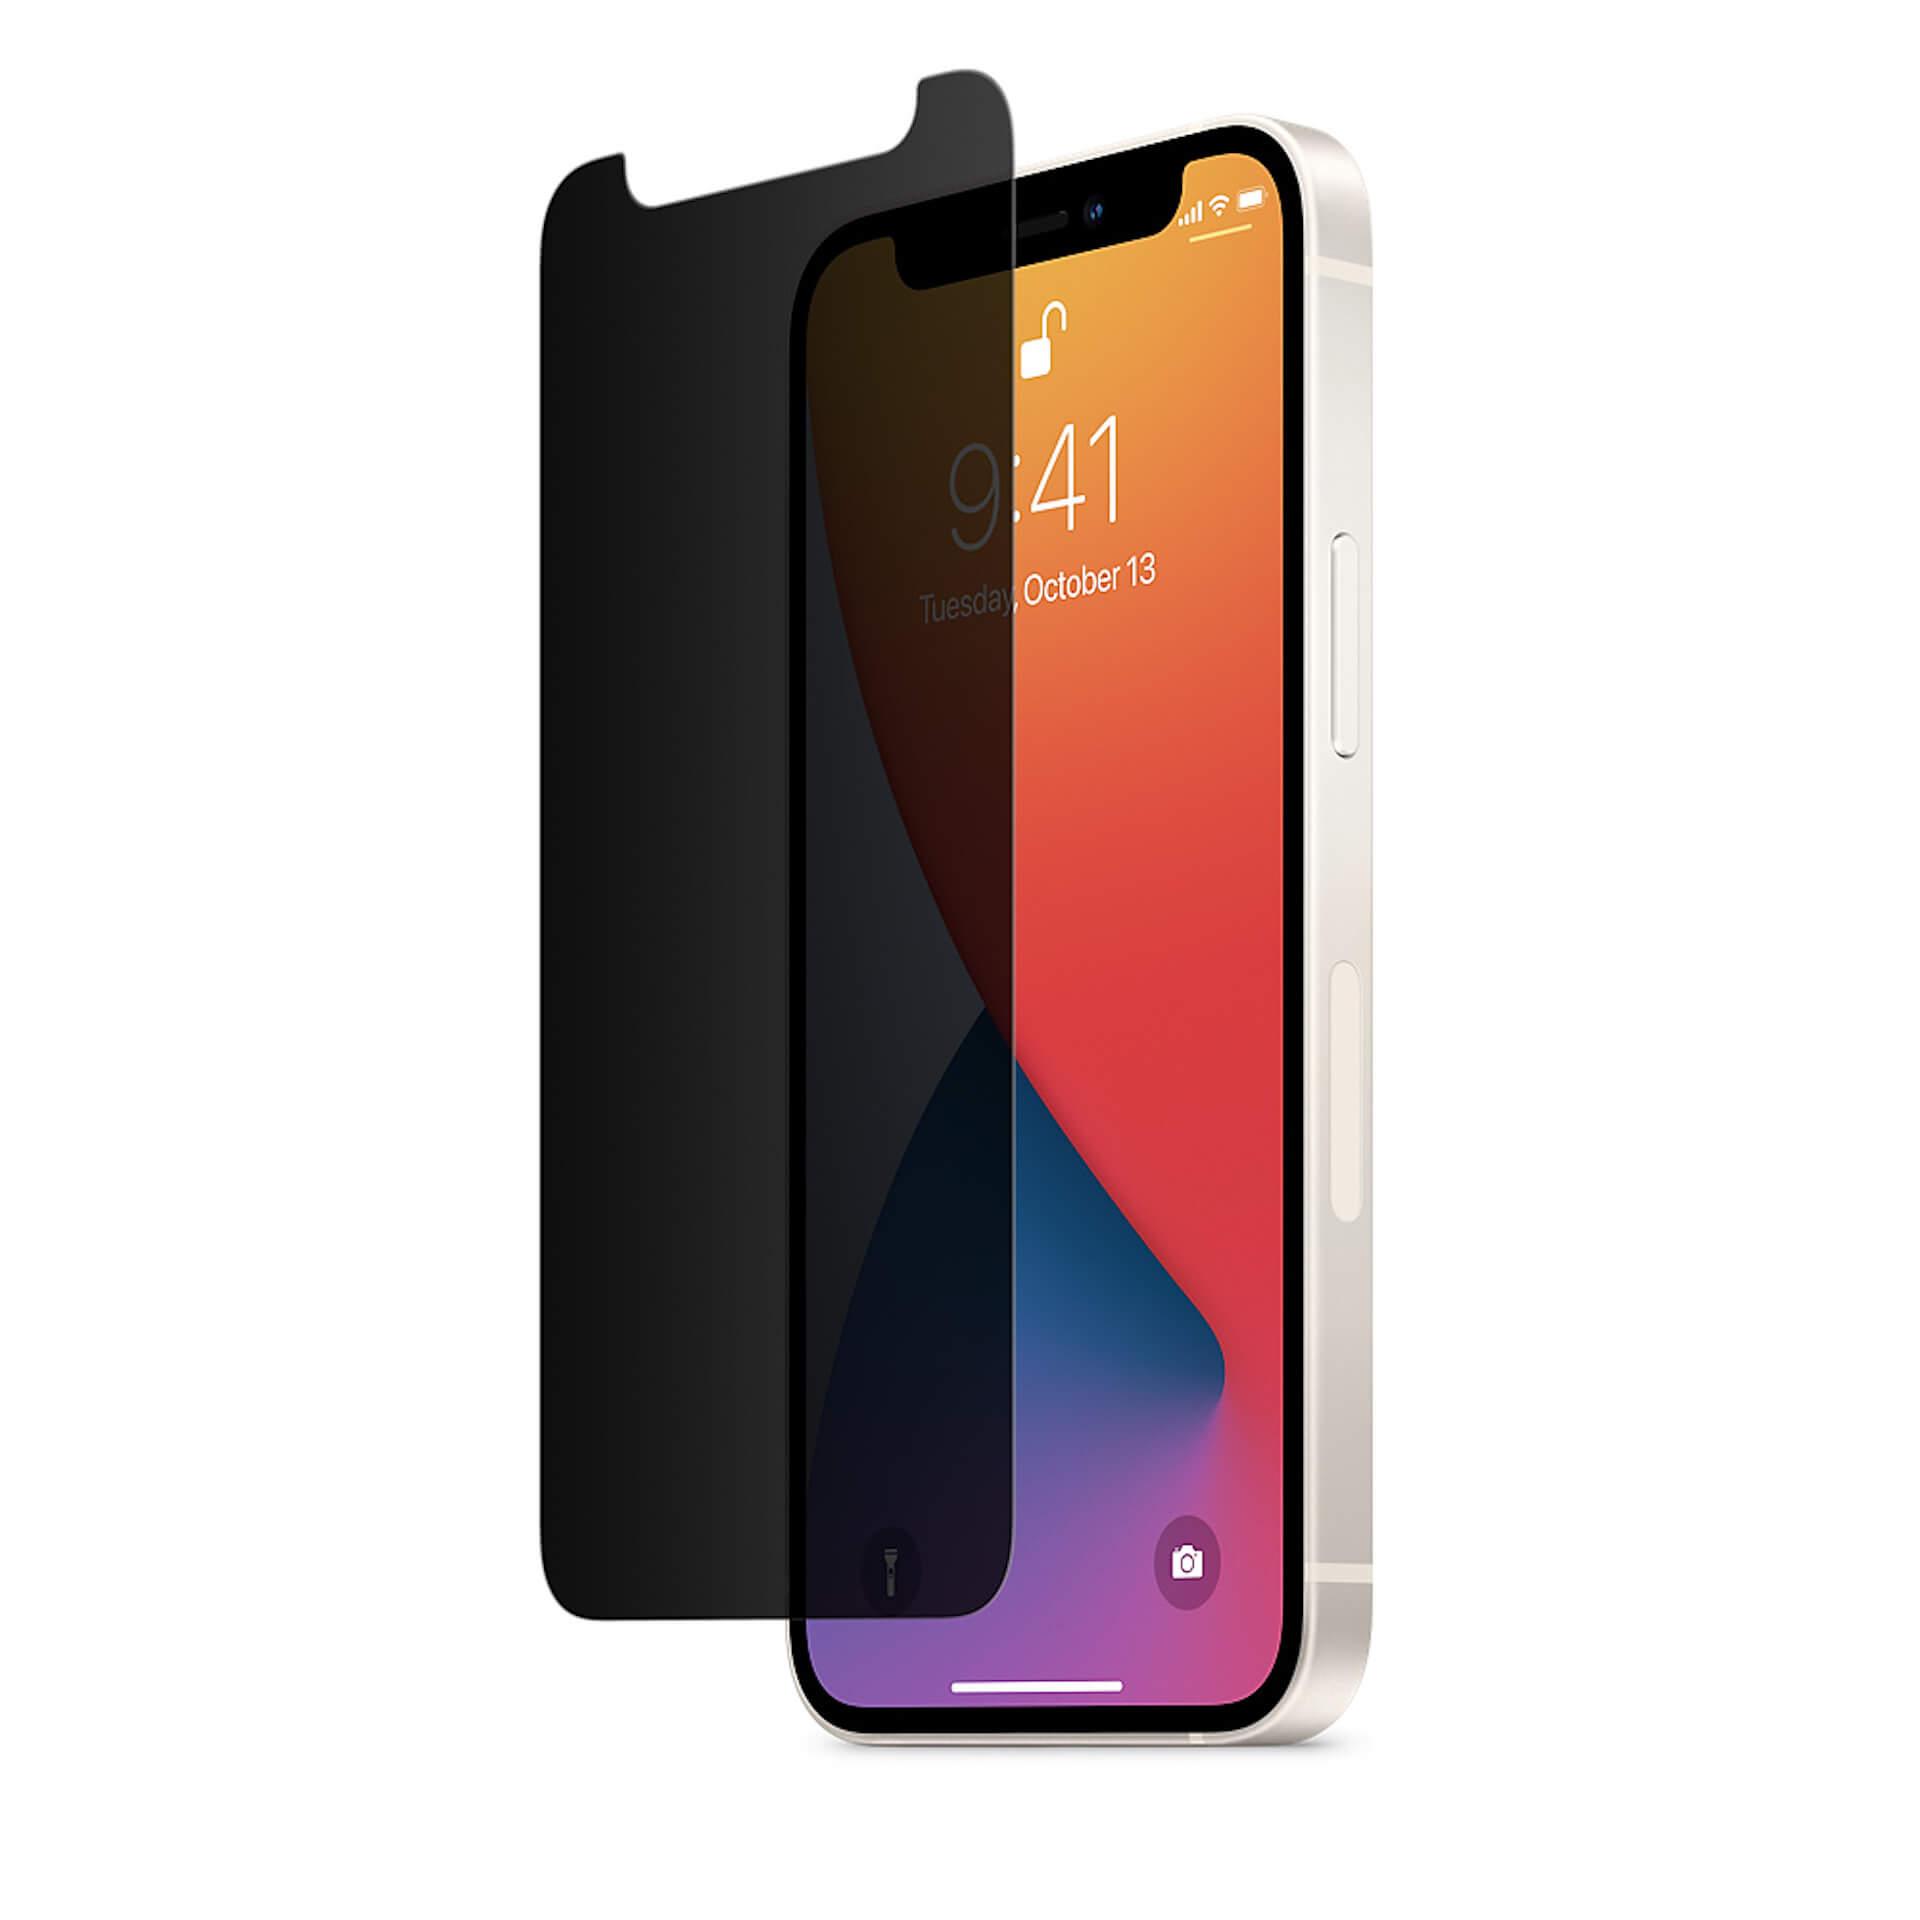 BelkinからiPhone 12シリーズに対応した高機能製品3点が発売!MagSafeを利用した3-in-1のワイヤレス充電器などが登場 tech210120_magsafe_belkin_8